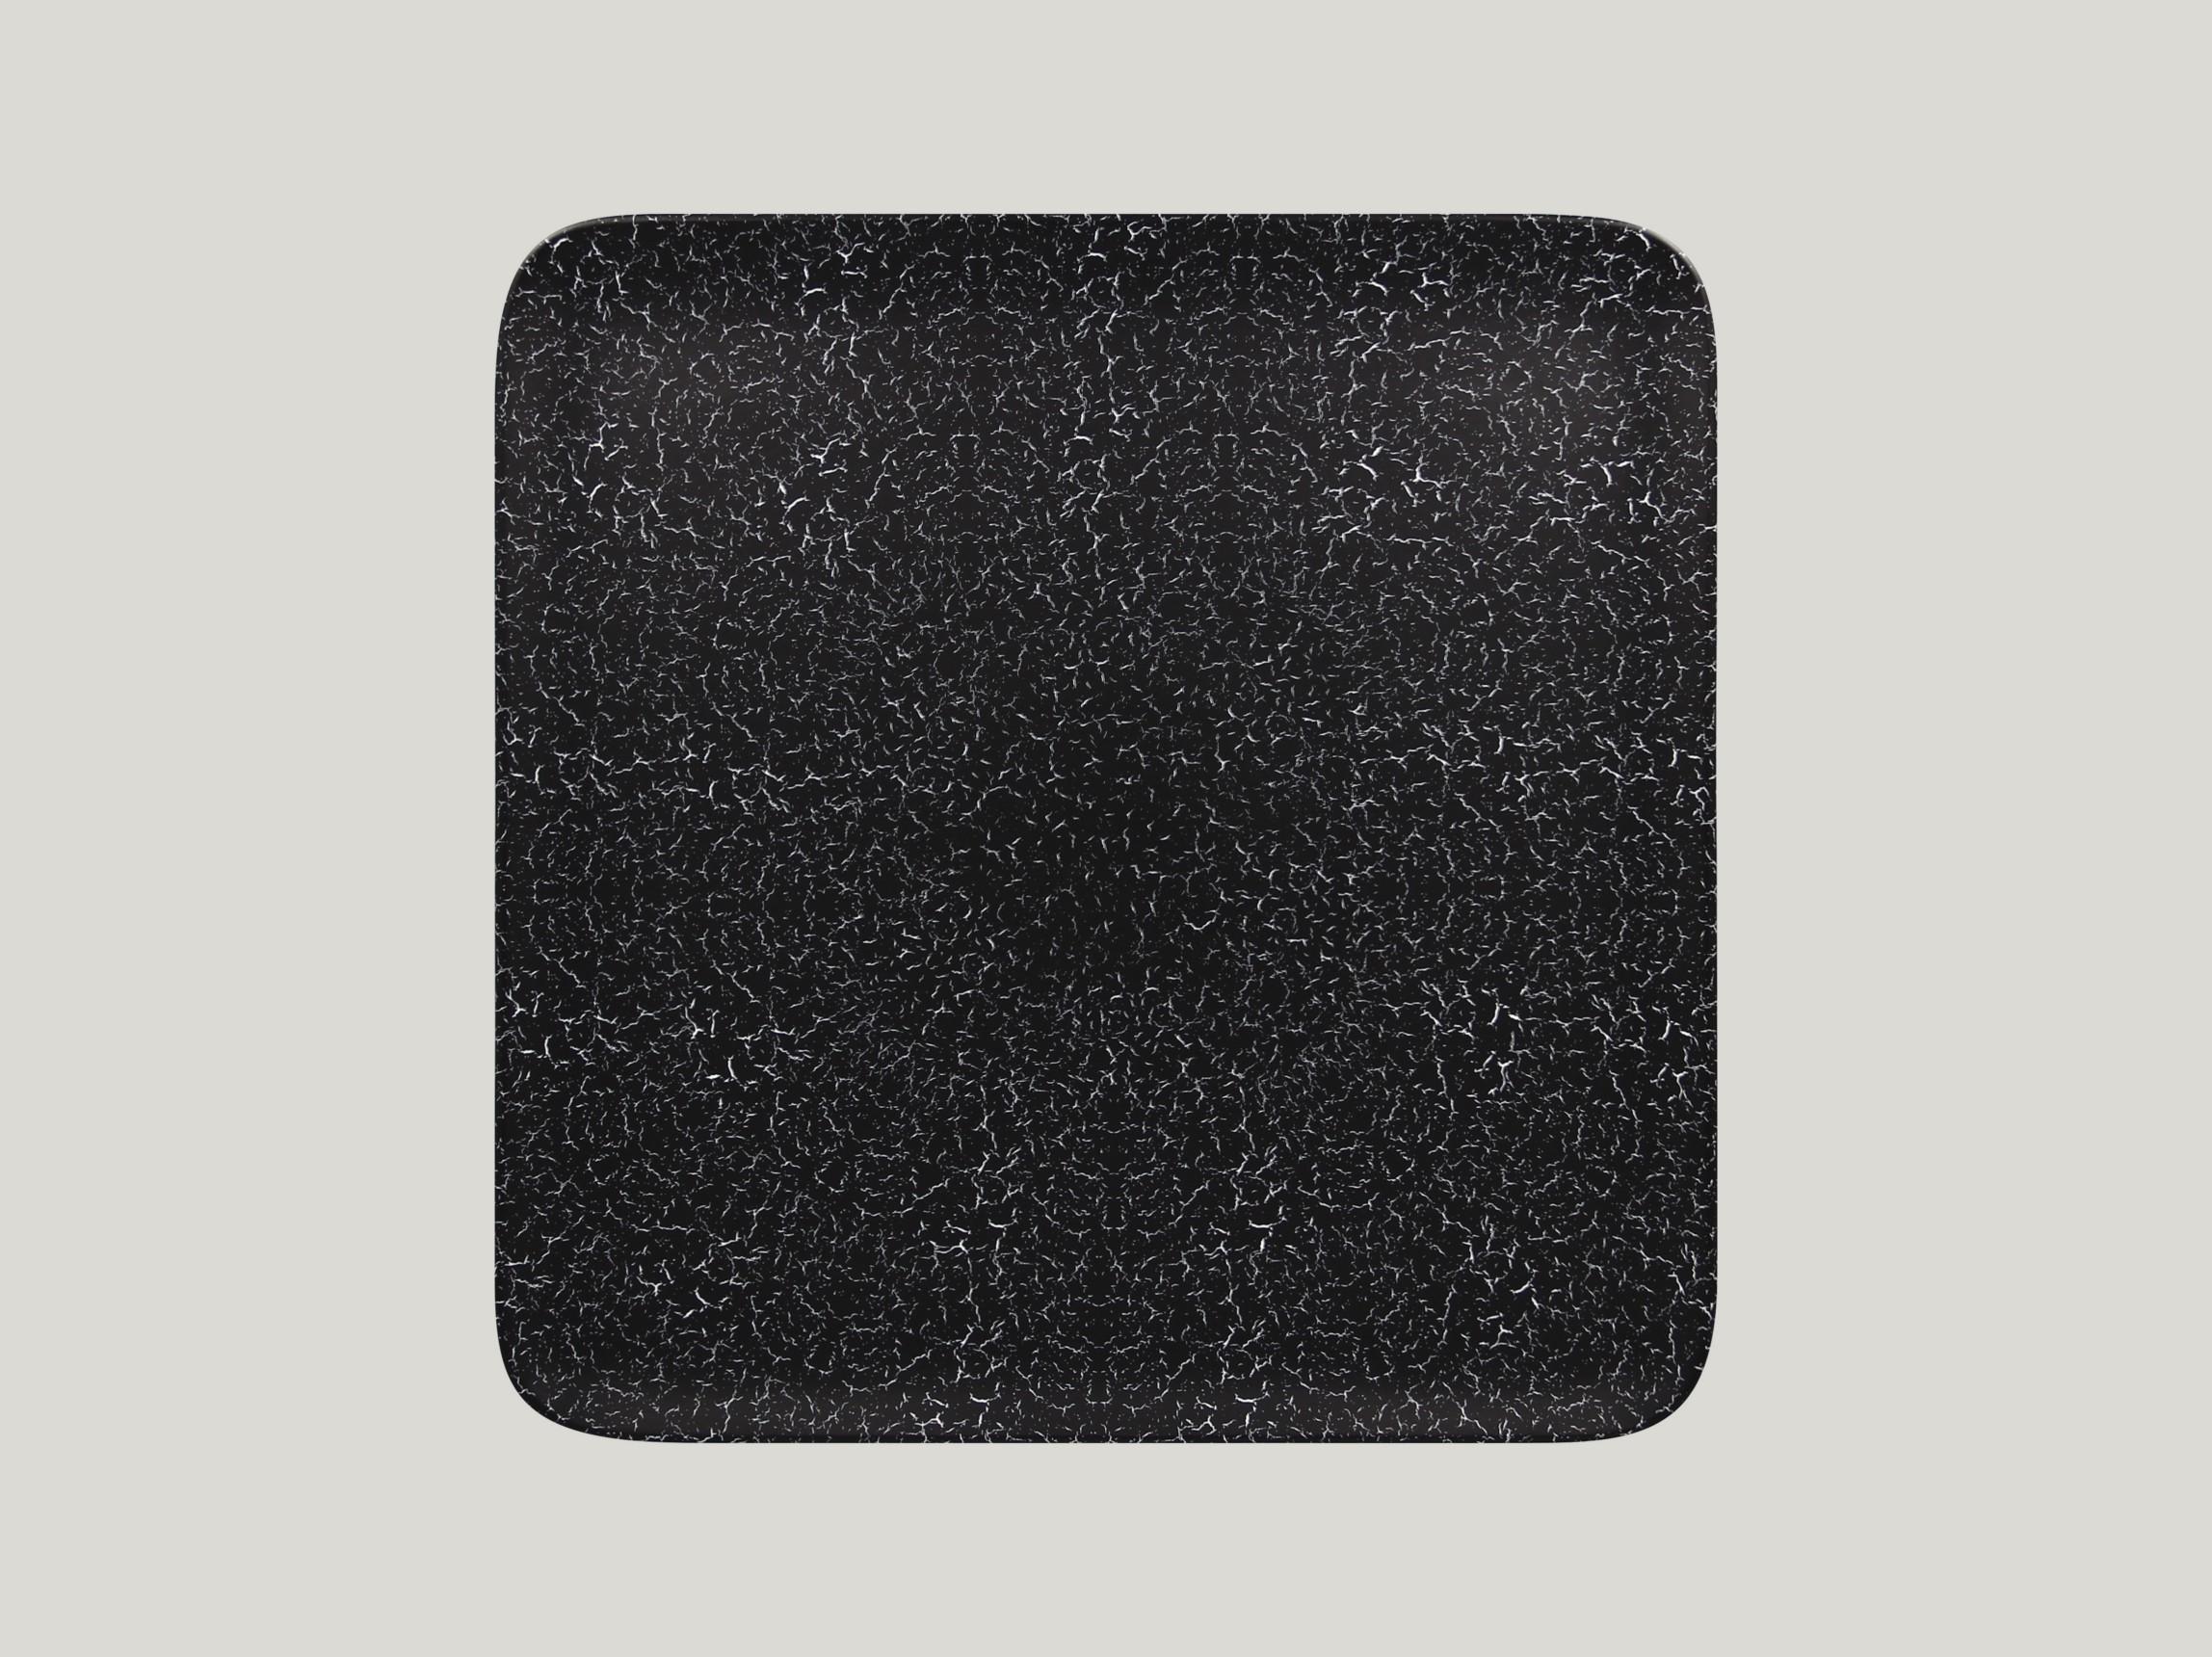 Talíř čtvercový 30 x 30 cm - černá